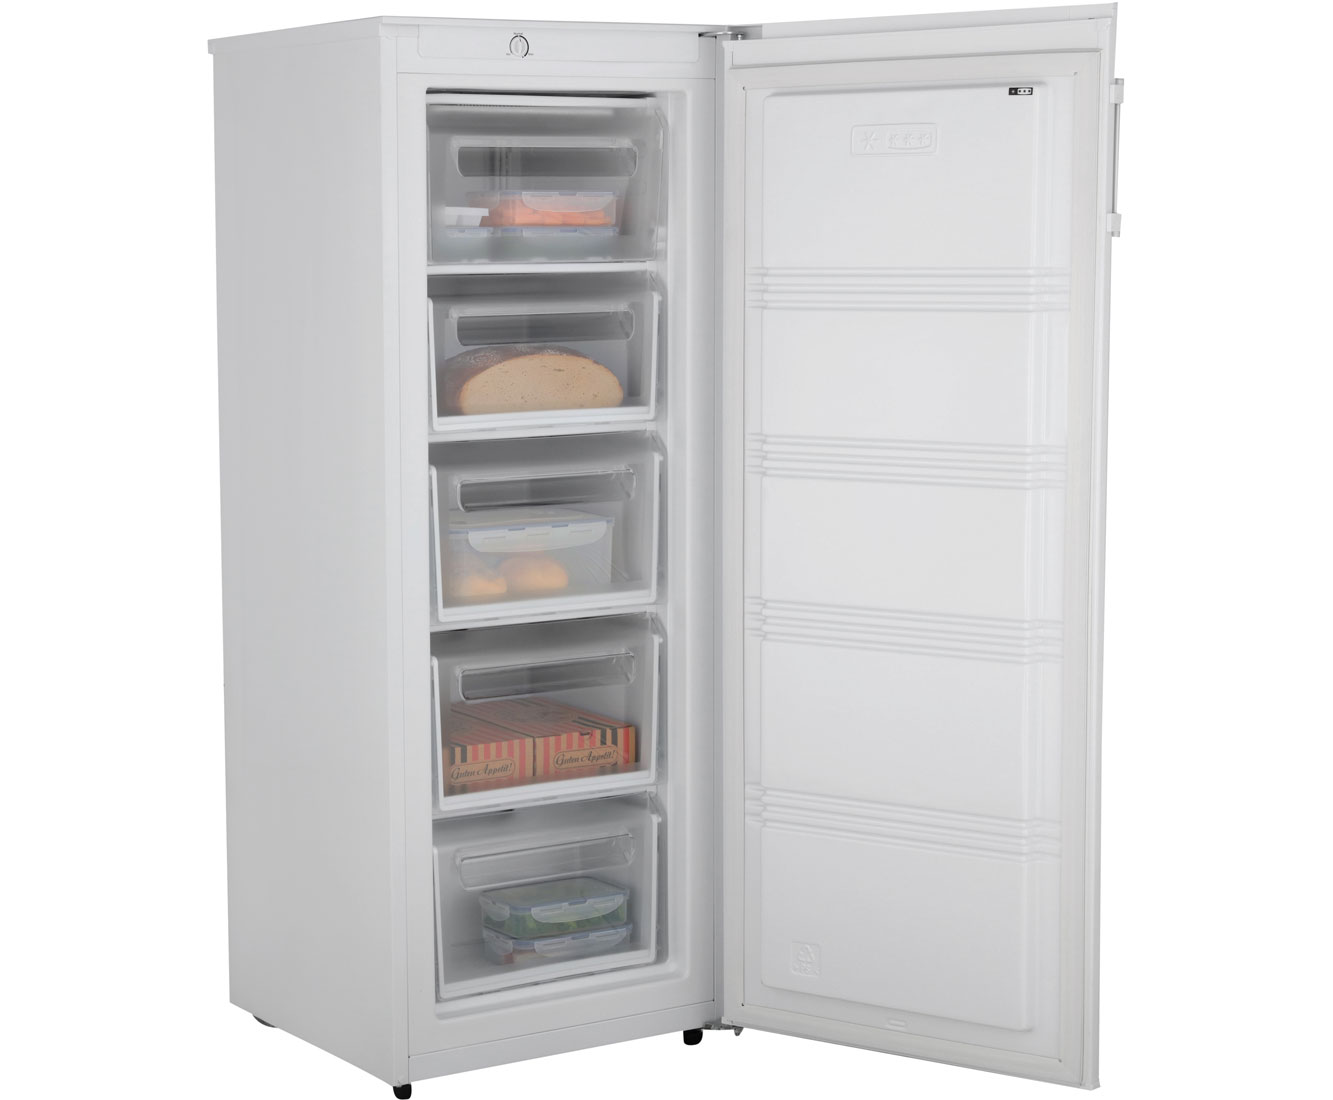 Bomann Kühlschrank Hotline : Bomann gs gefrierschrank l weiß a